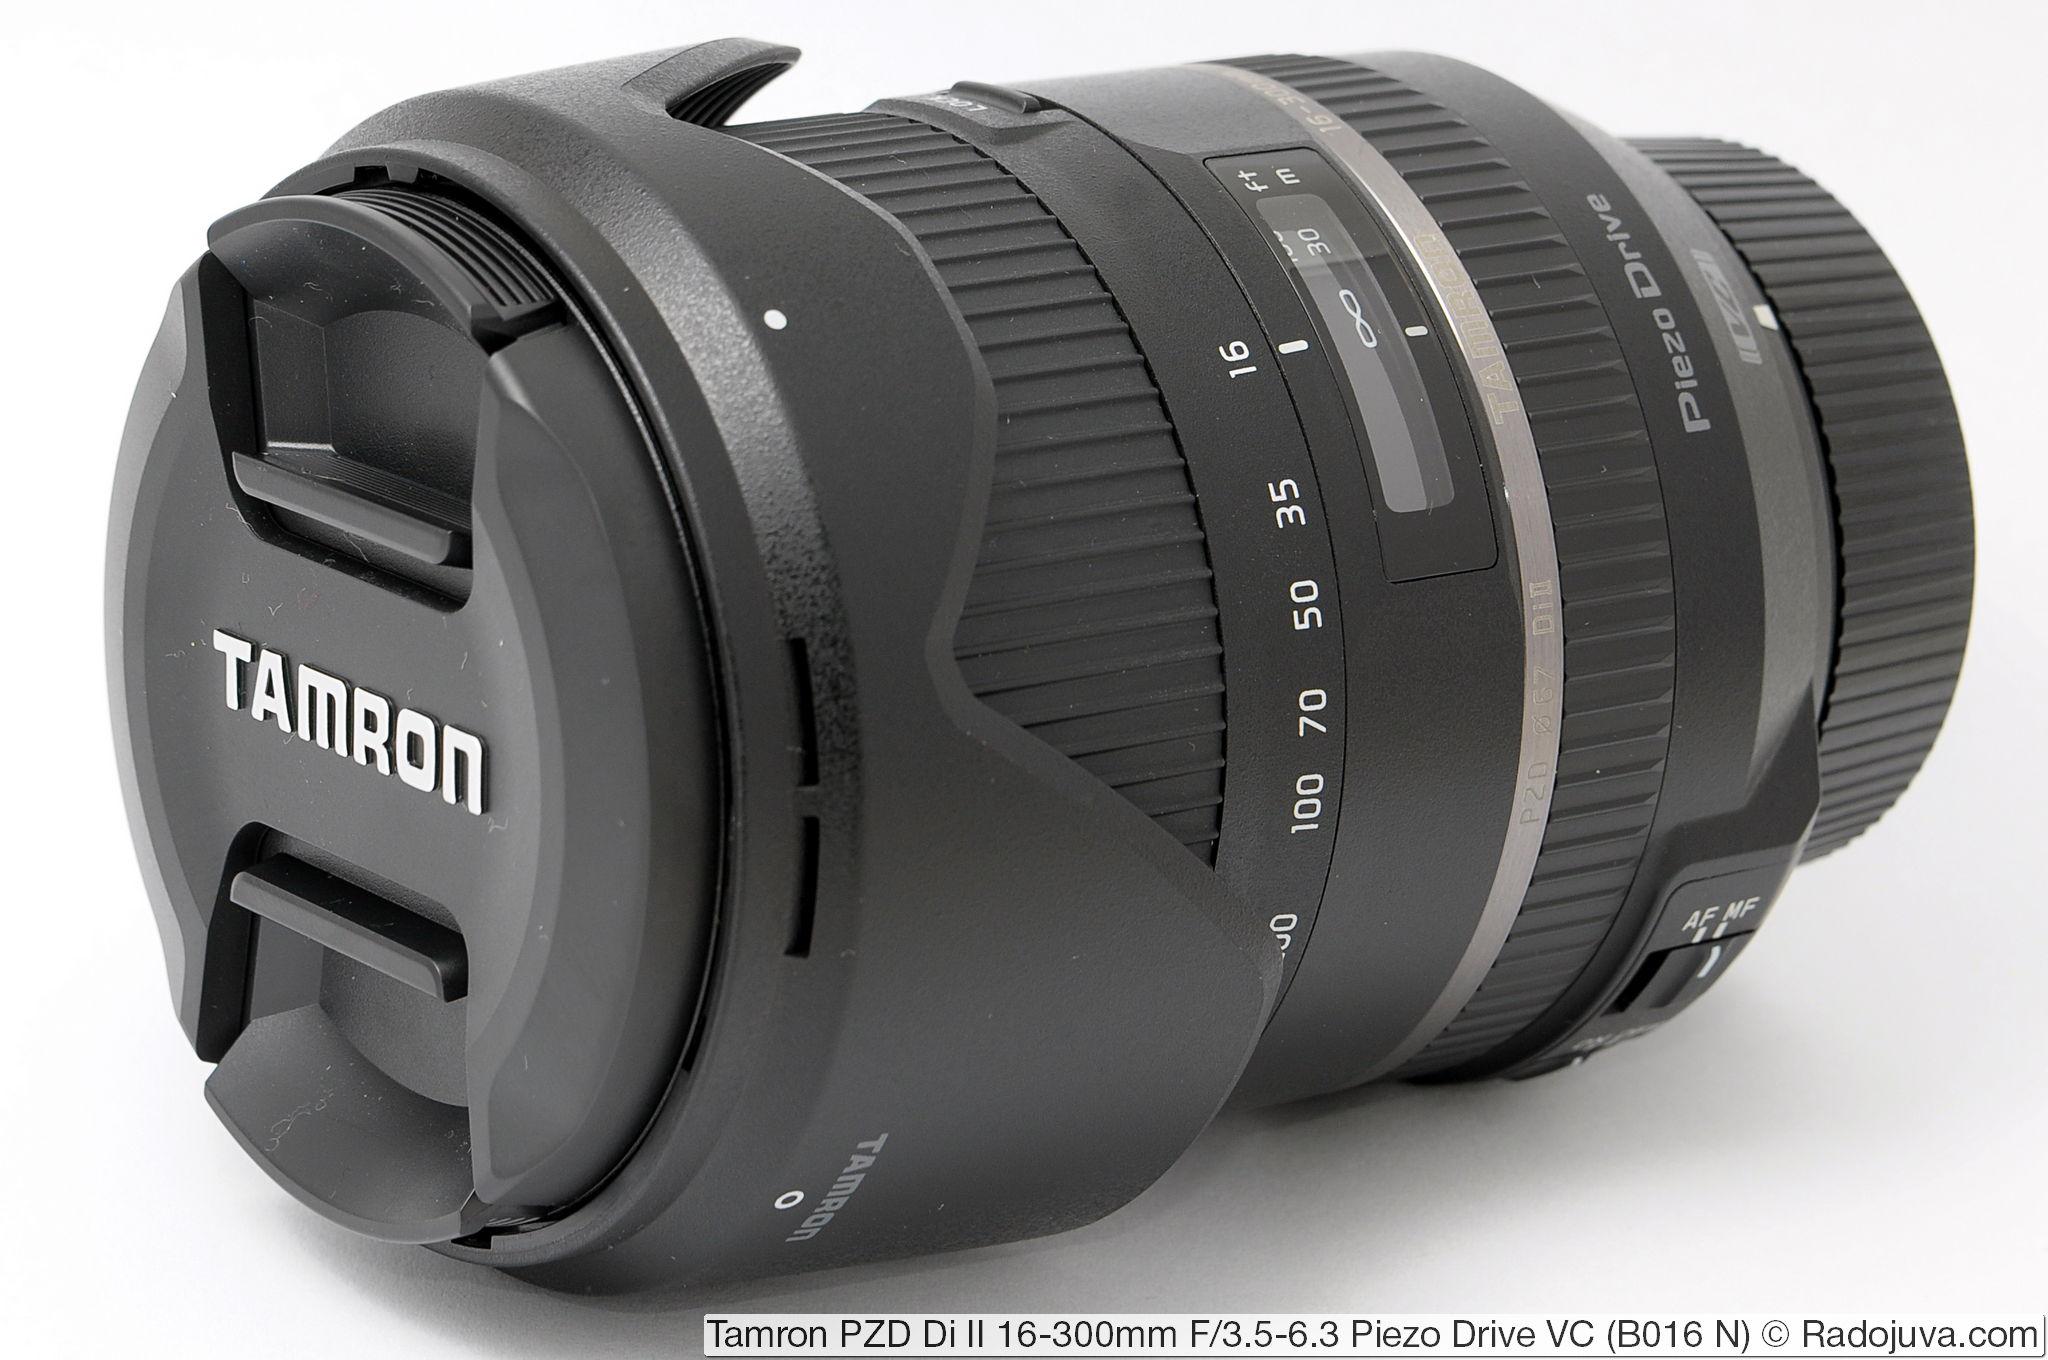 tamron 16 300mm f 3 5 6 3 di ii pzd vc model b016n. Black Bedroom Furniture Sets. Home Design Ideas